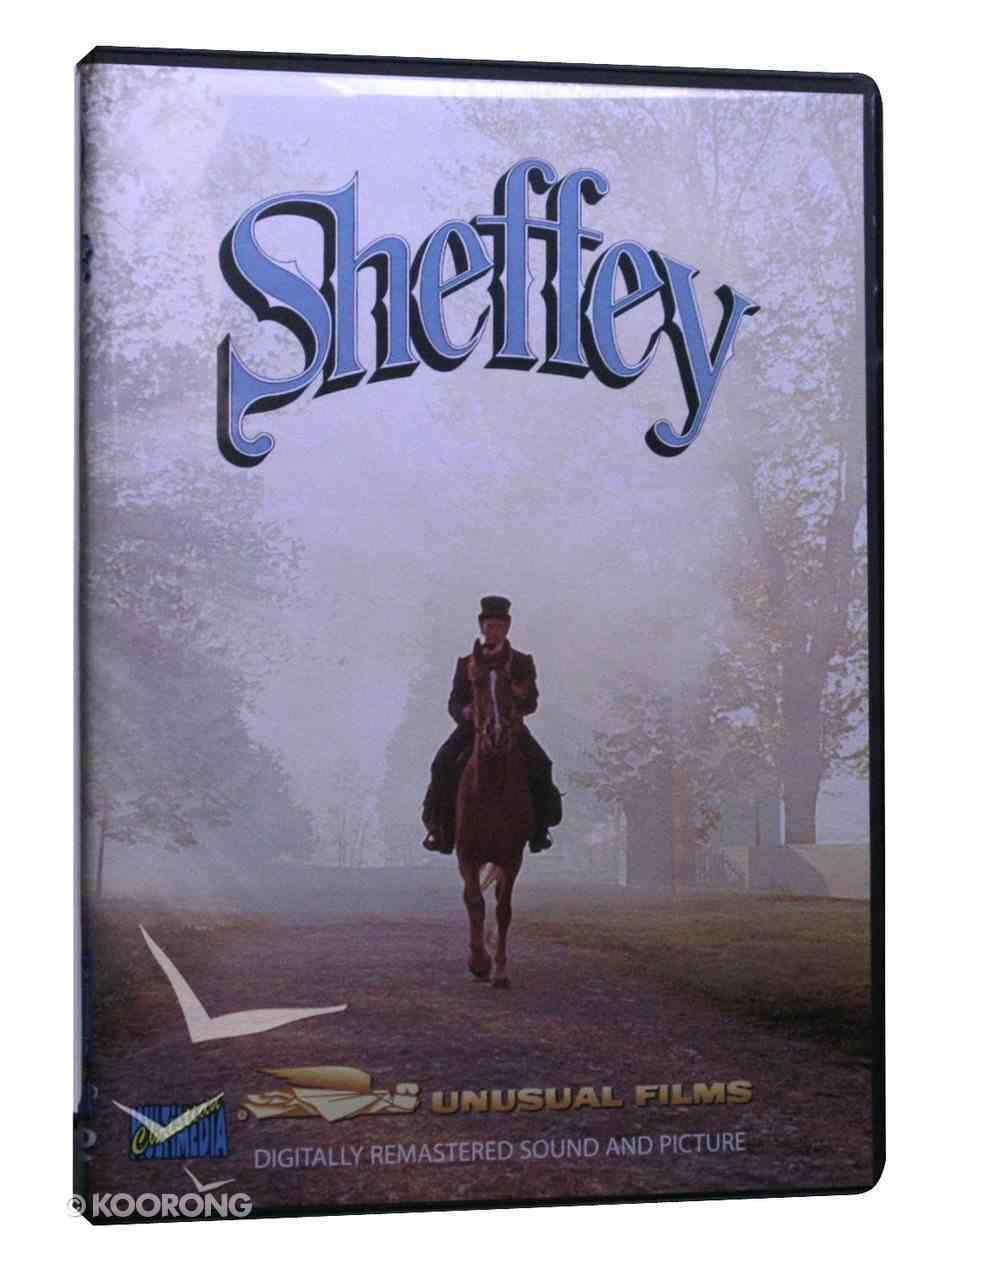 Sheffey DVD